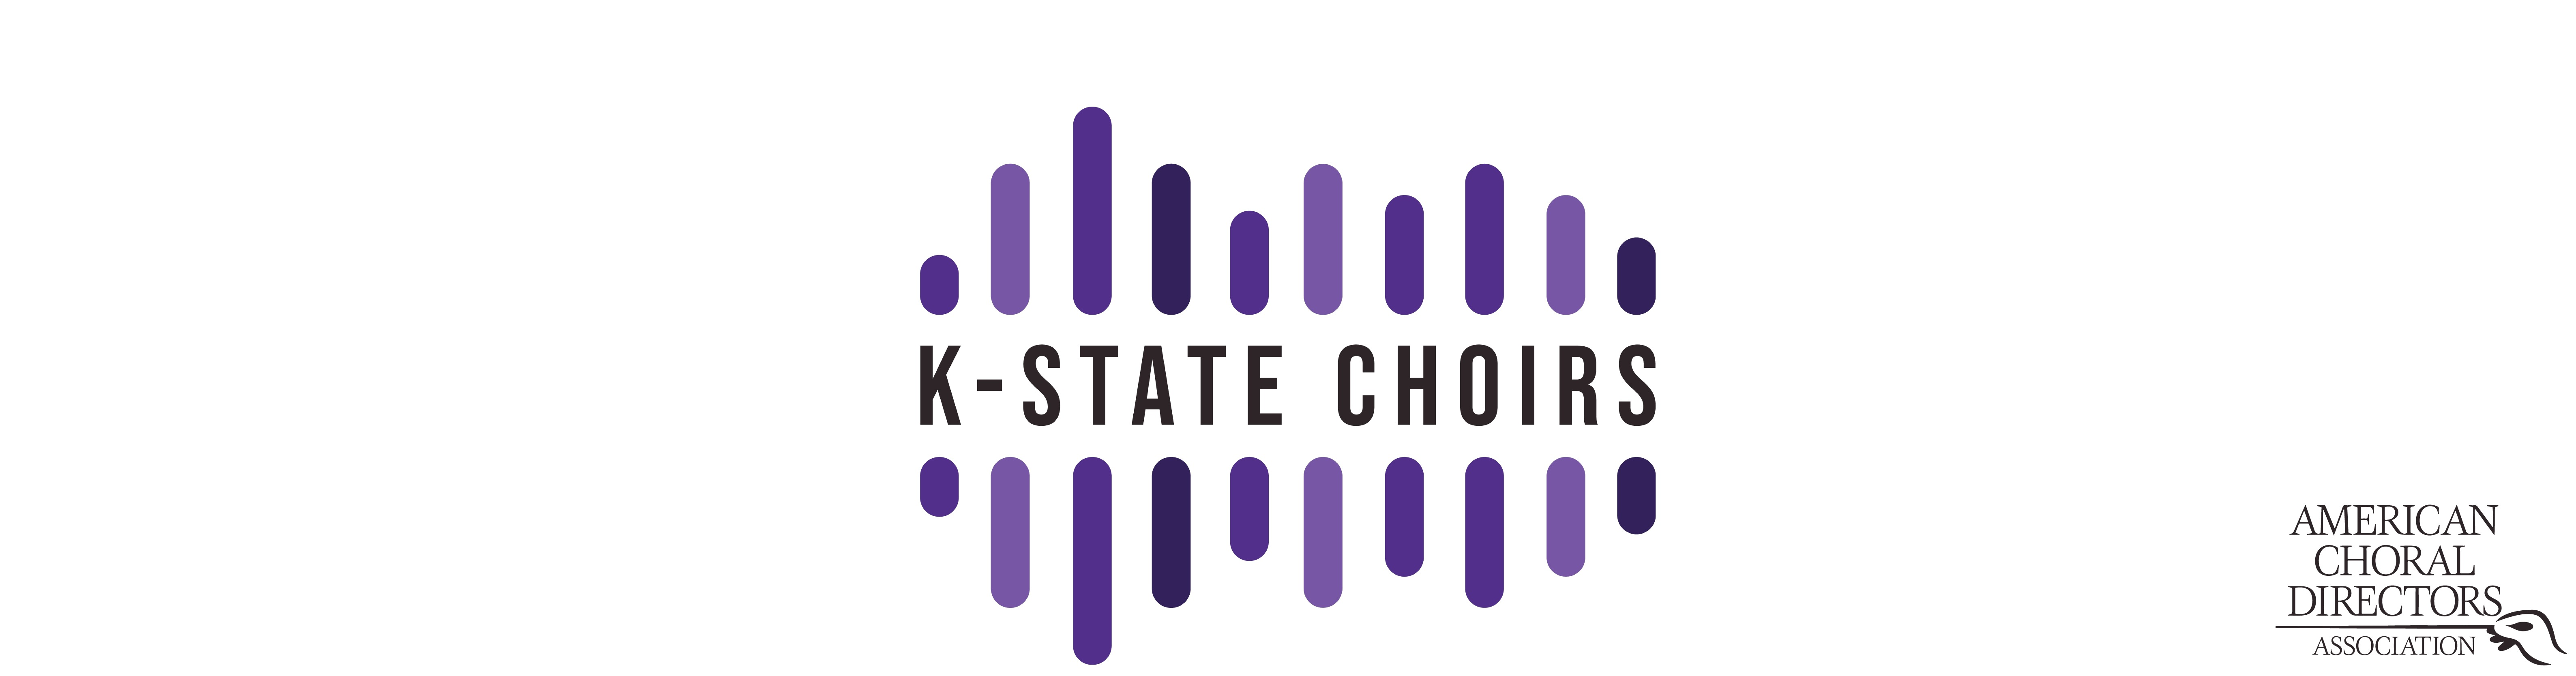 K-State Choirs